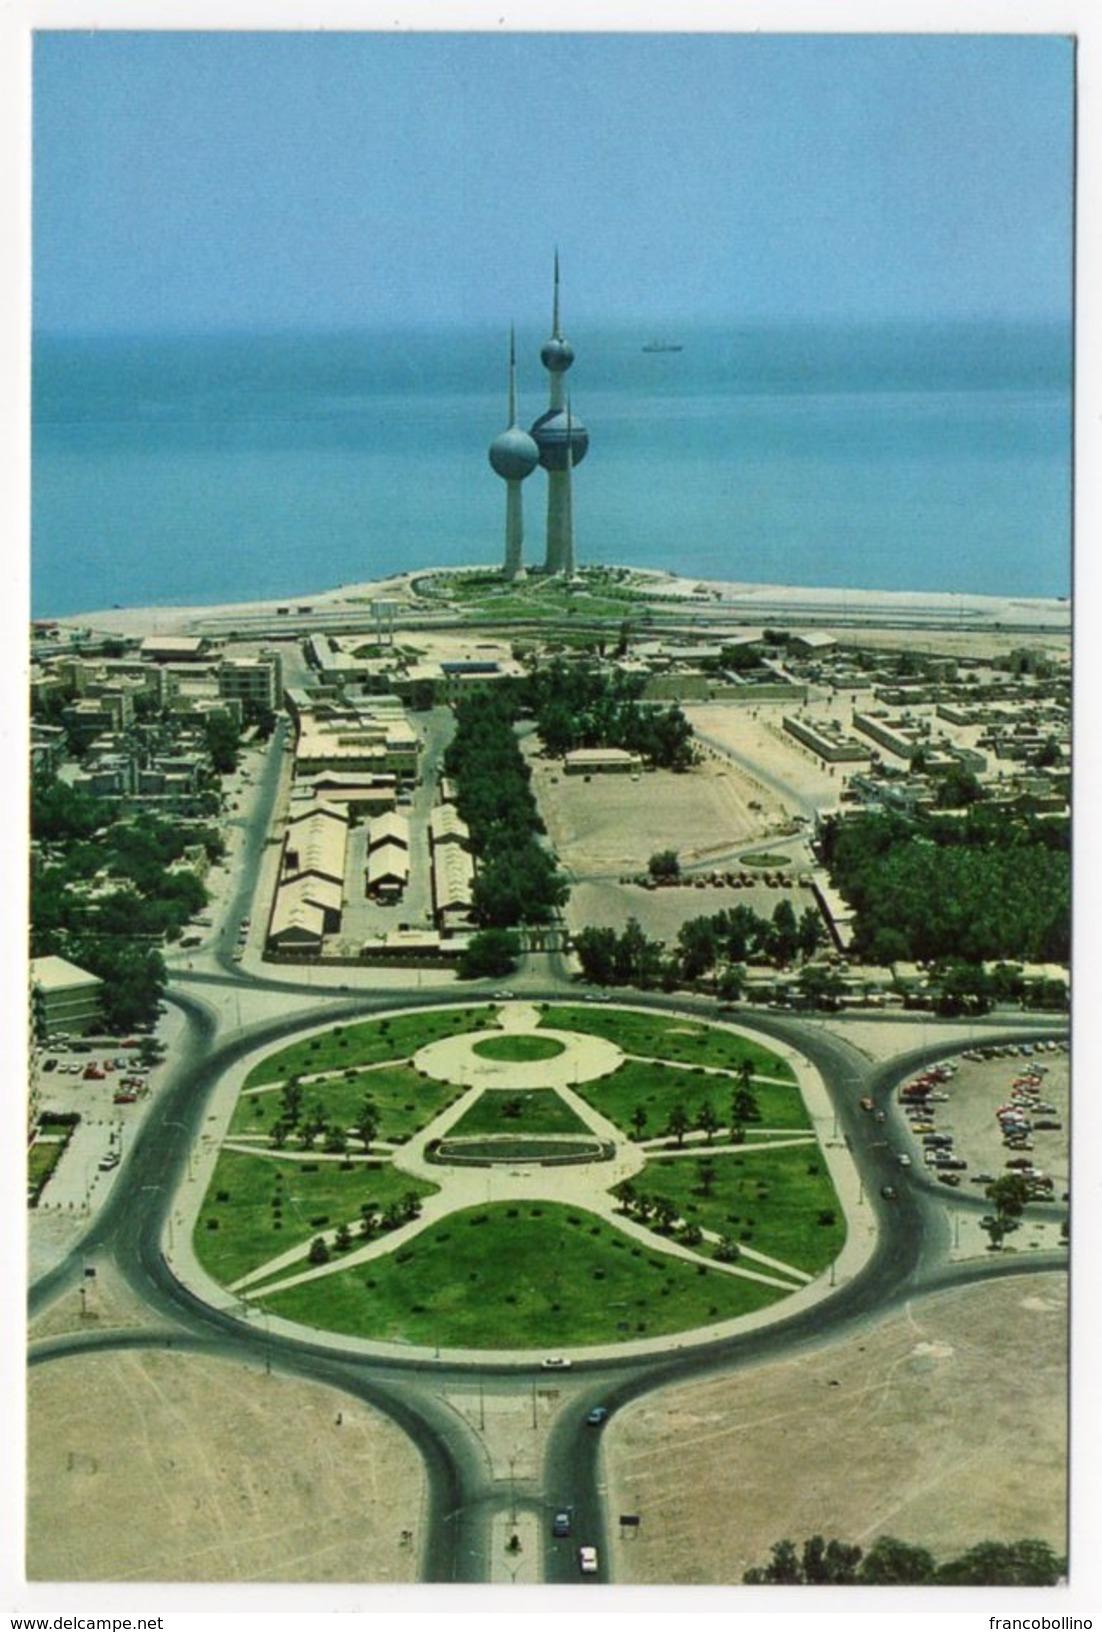 KUWAIT - DASMAN SQUARE - Kuwait